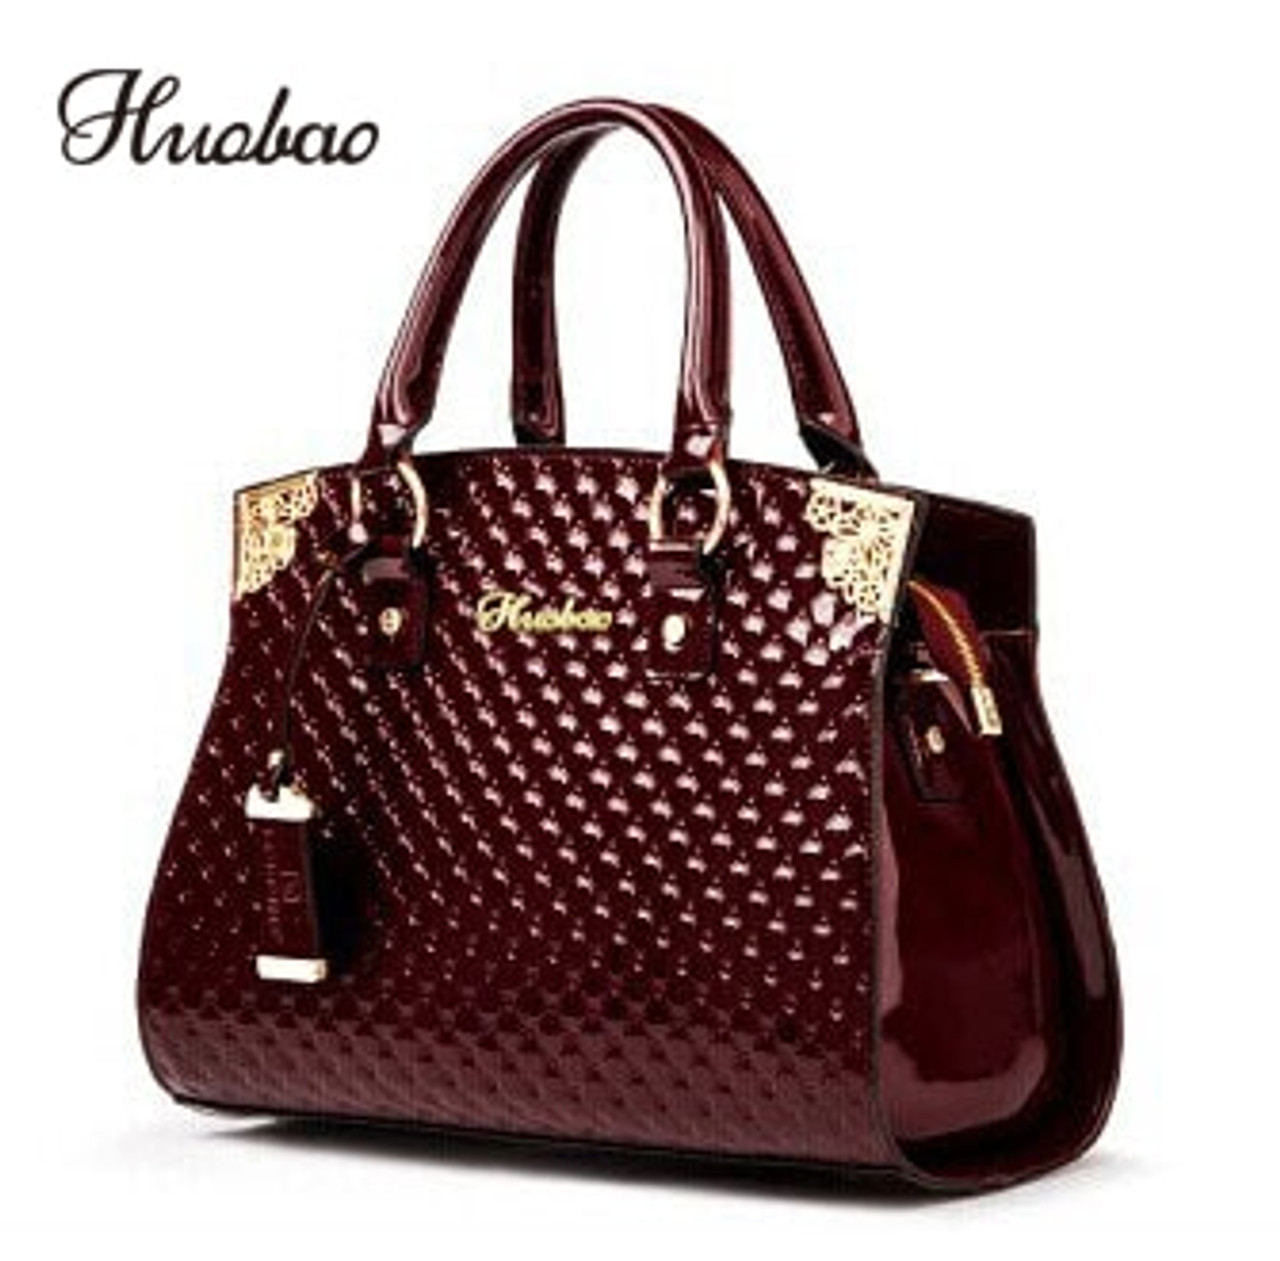 e6665b1e090 Women Genuine Patent Leather Handbags luxury Shoulder Crossbody Bag Handbag  Designer Purse Satchel Messenger Bag Ladies Tote bag